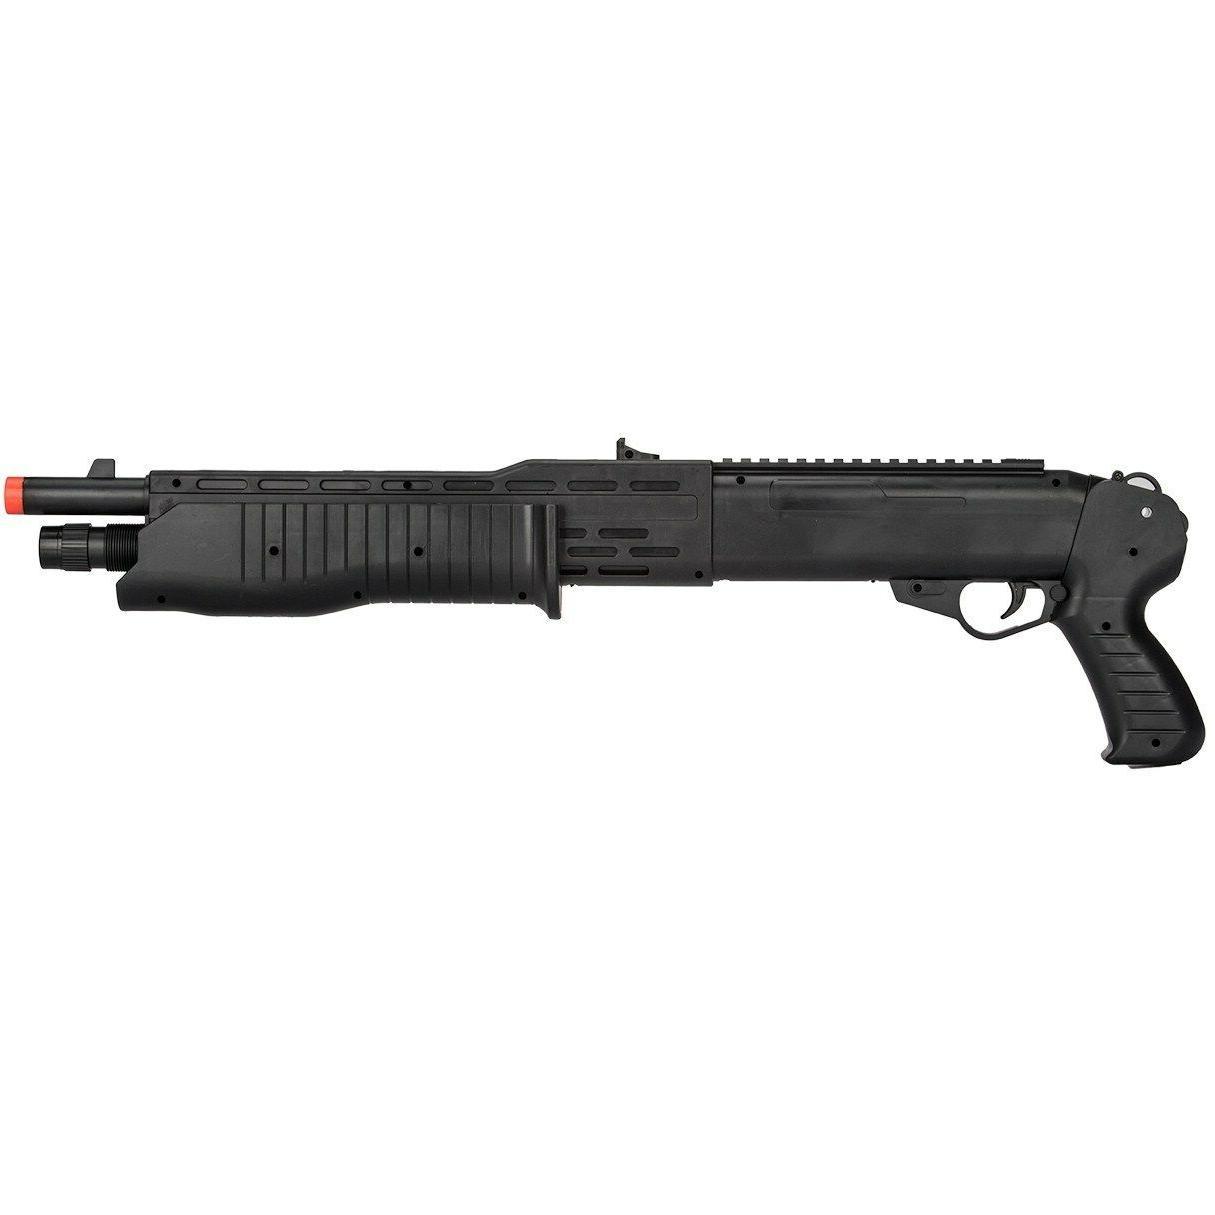 UKARMS SPAS ACTION SPRING RIFLE GUN w/ 6mm BB BBs